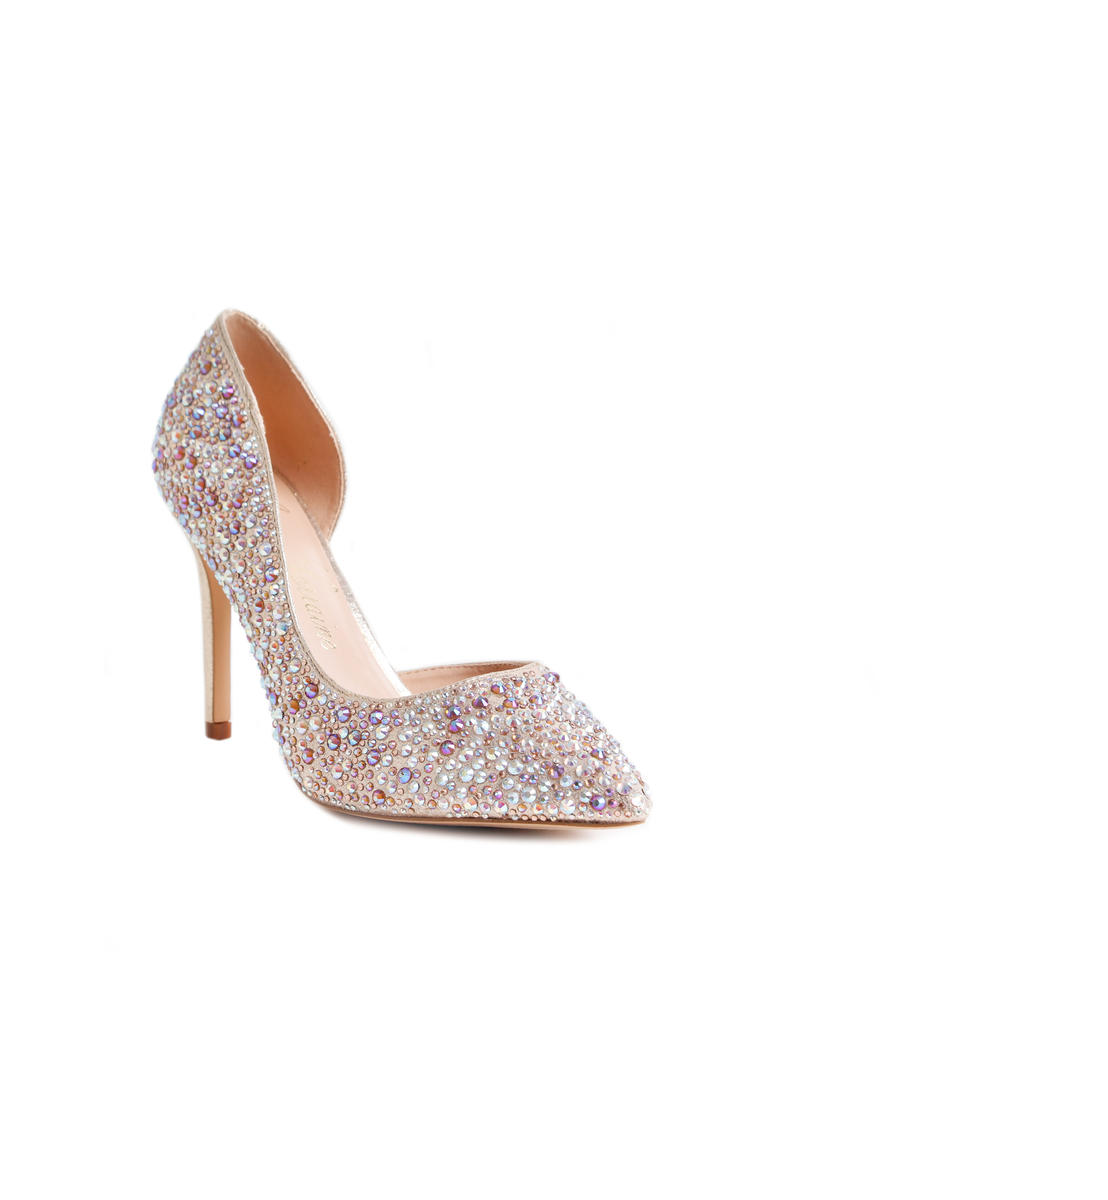 Embellished Pointy Pump Heel